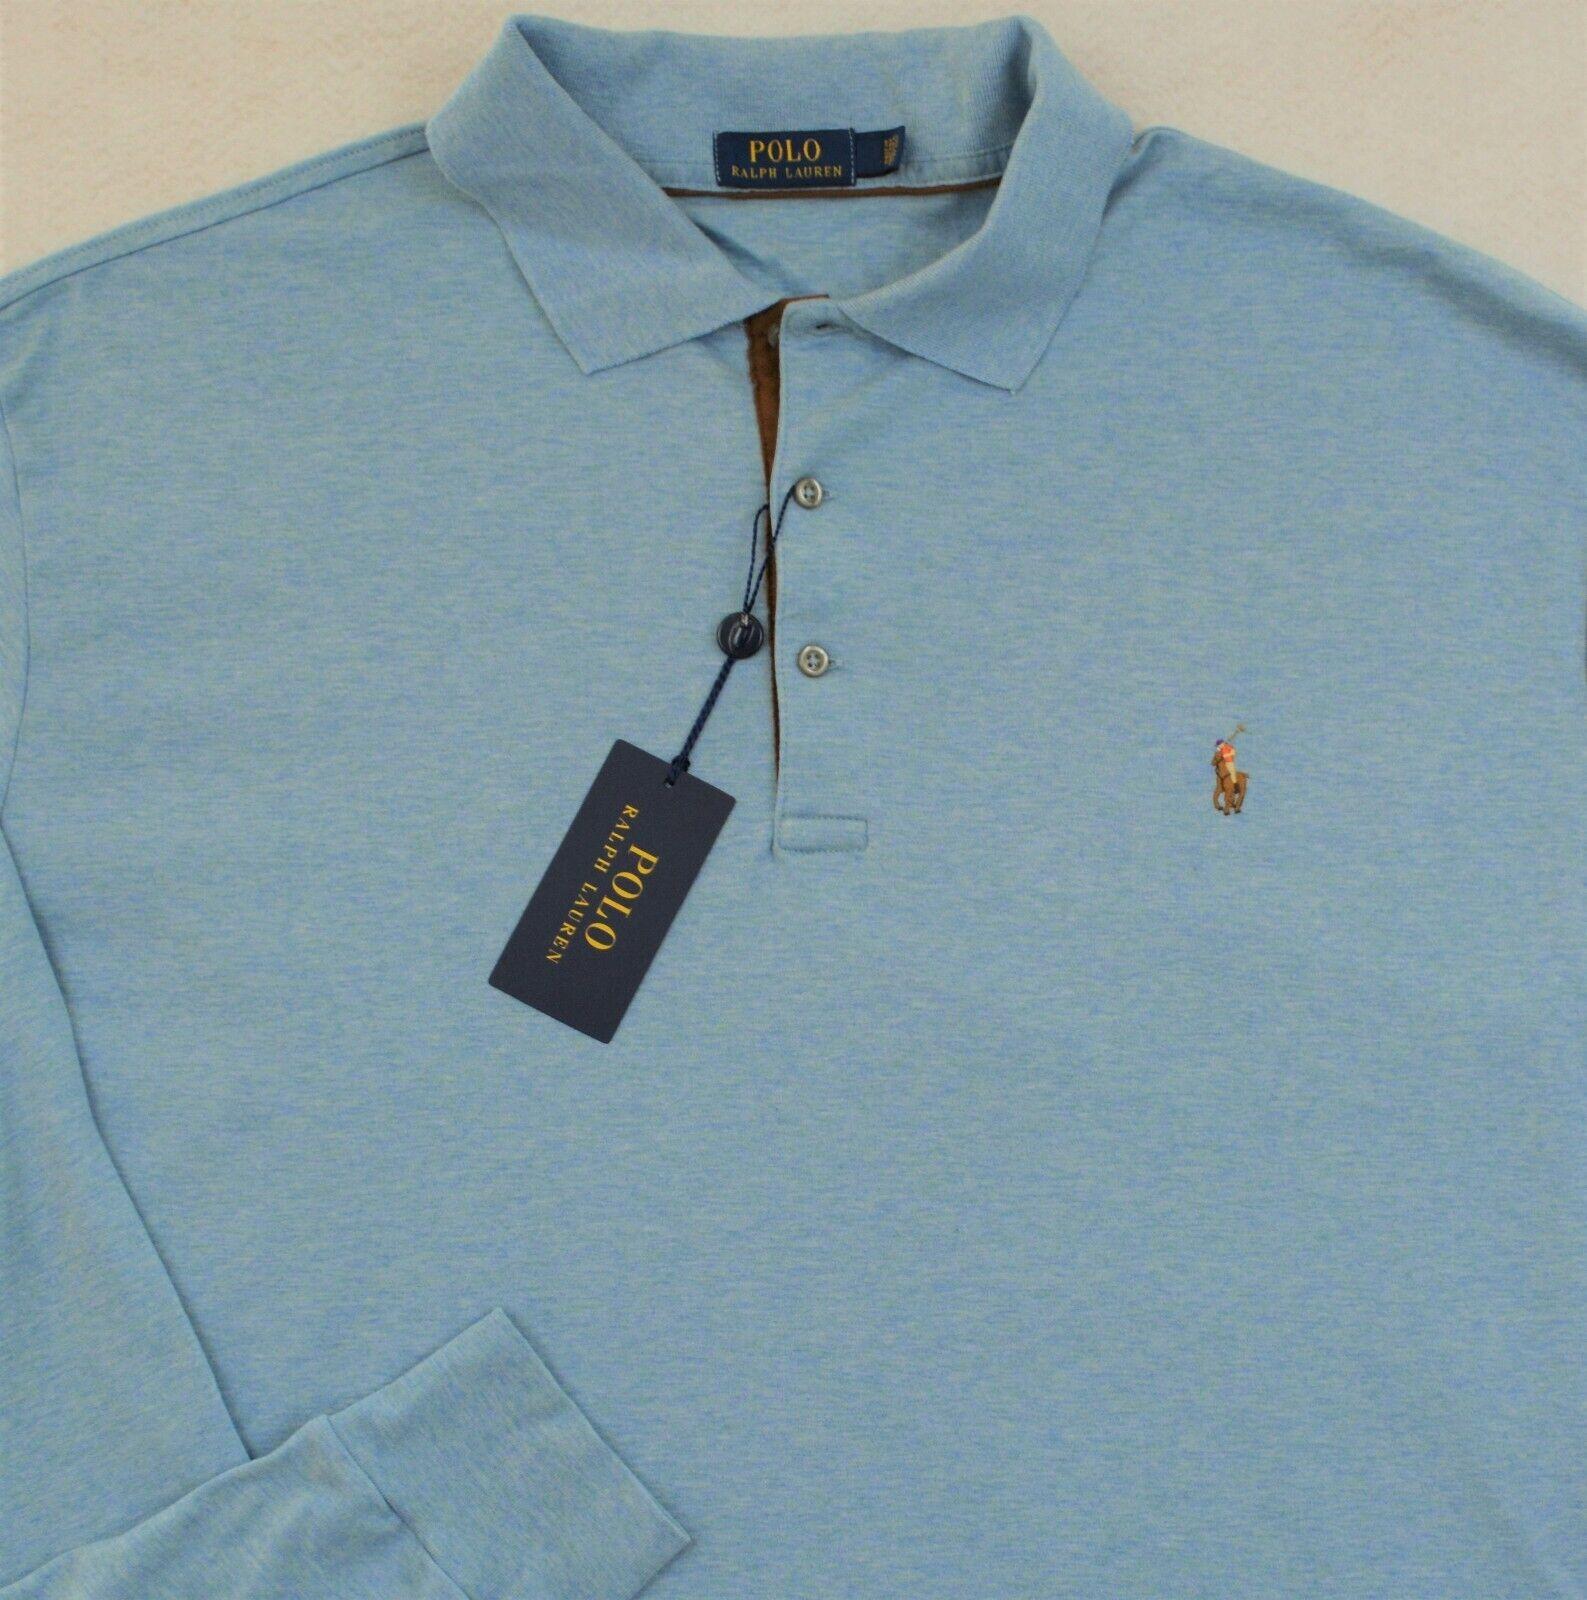 Polo Ralph Lauren Shirt Pima Soft Touch Long Sleeves bluee 2XLT 2XL Tall NWT